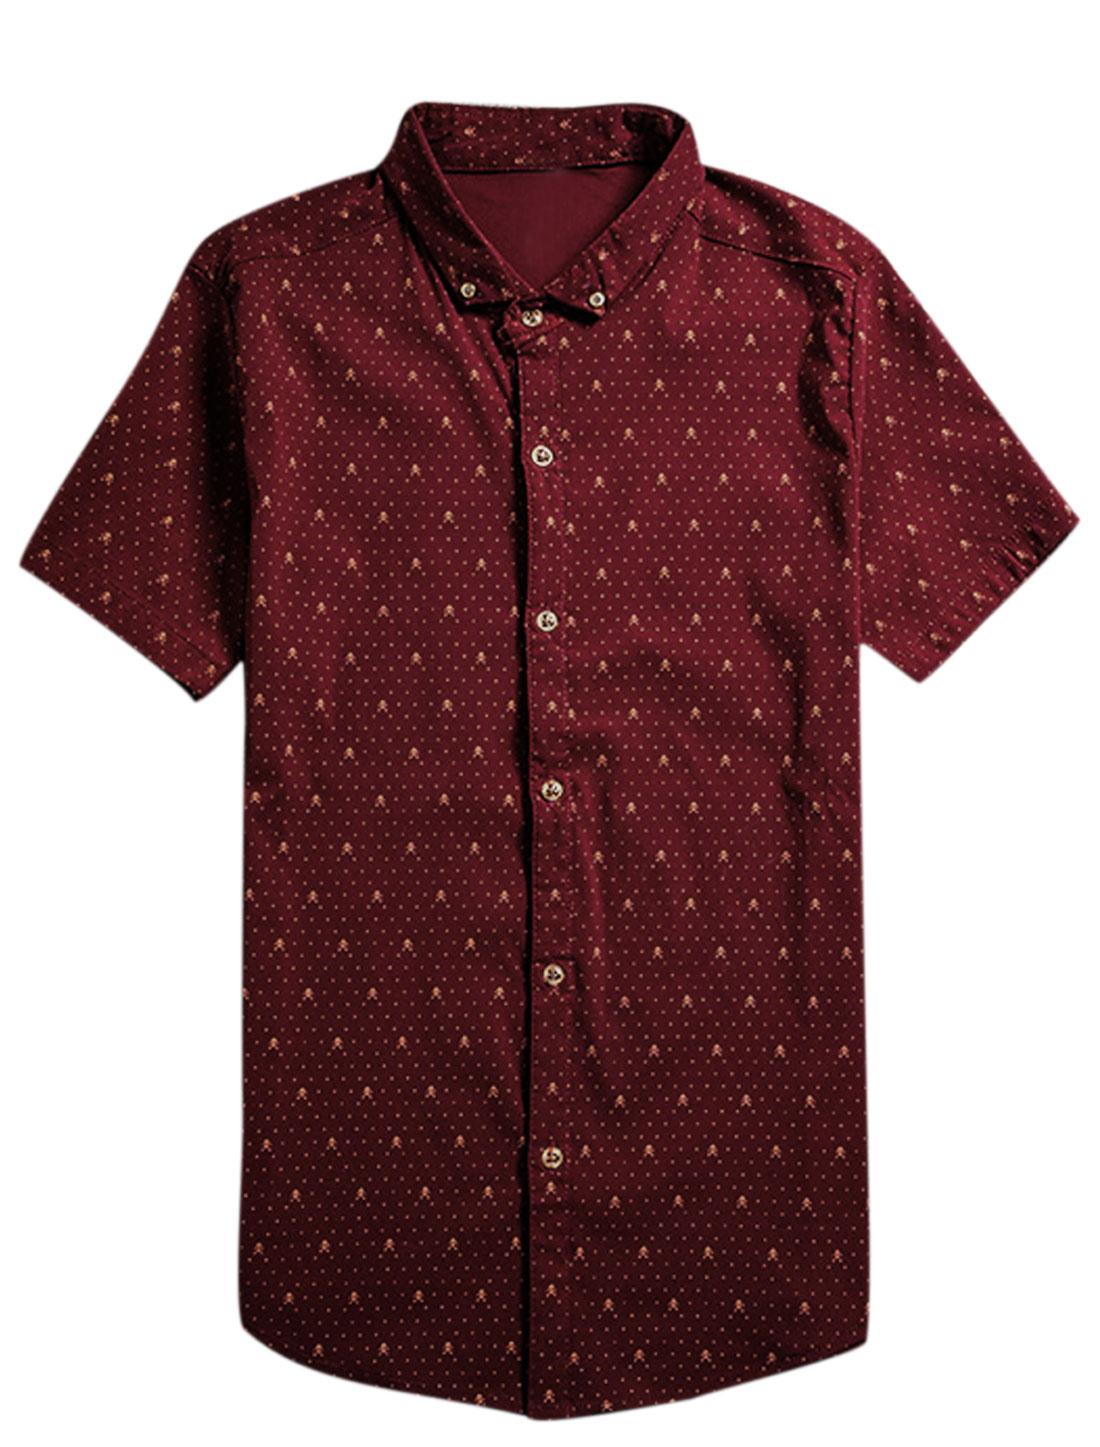 Men Short Sleeve Point Collar Skull Print Button Down Shirt Burgundy S